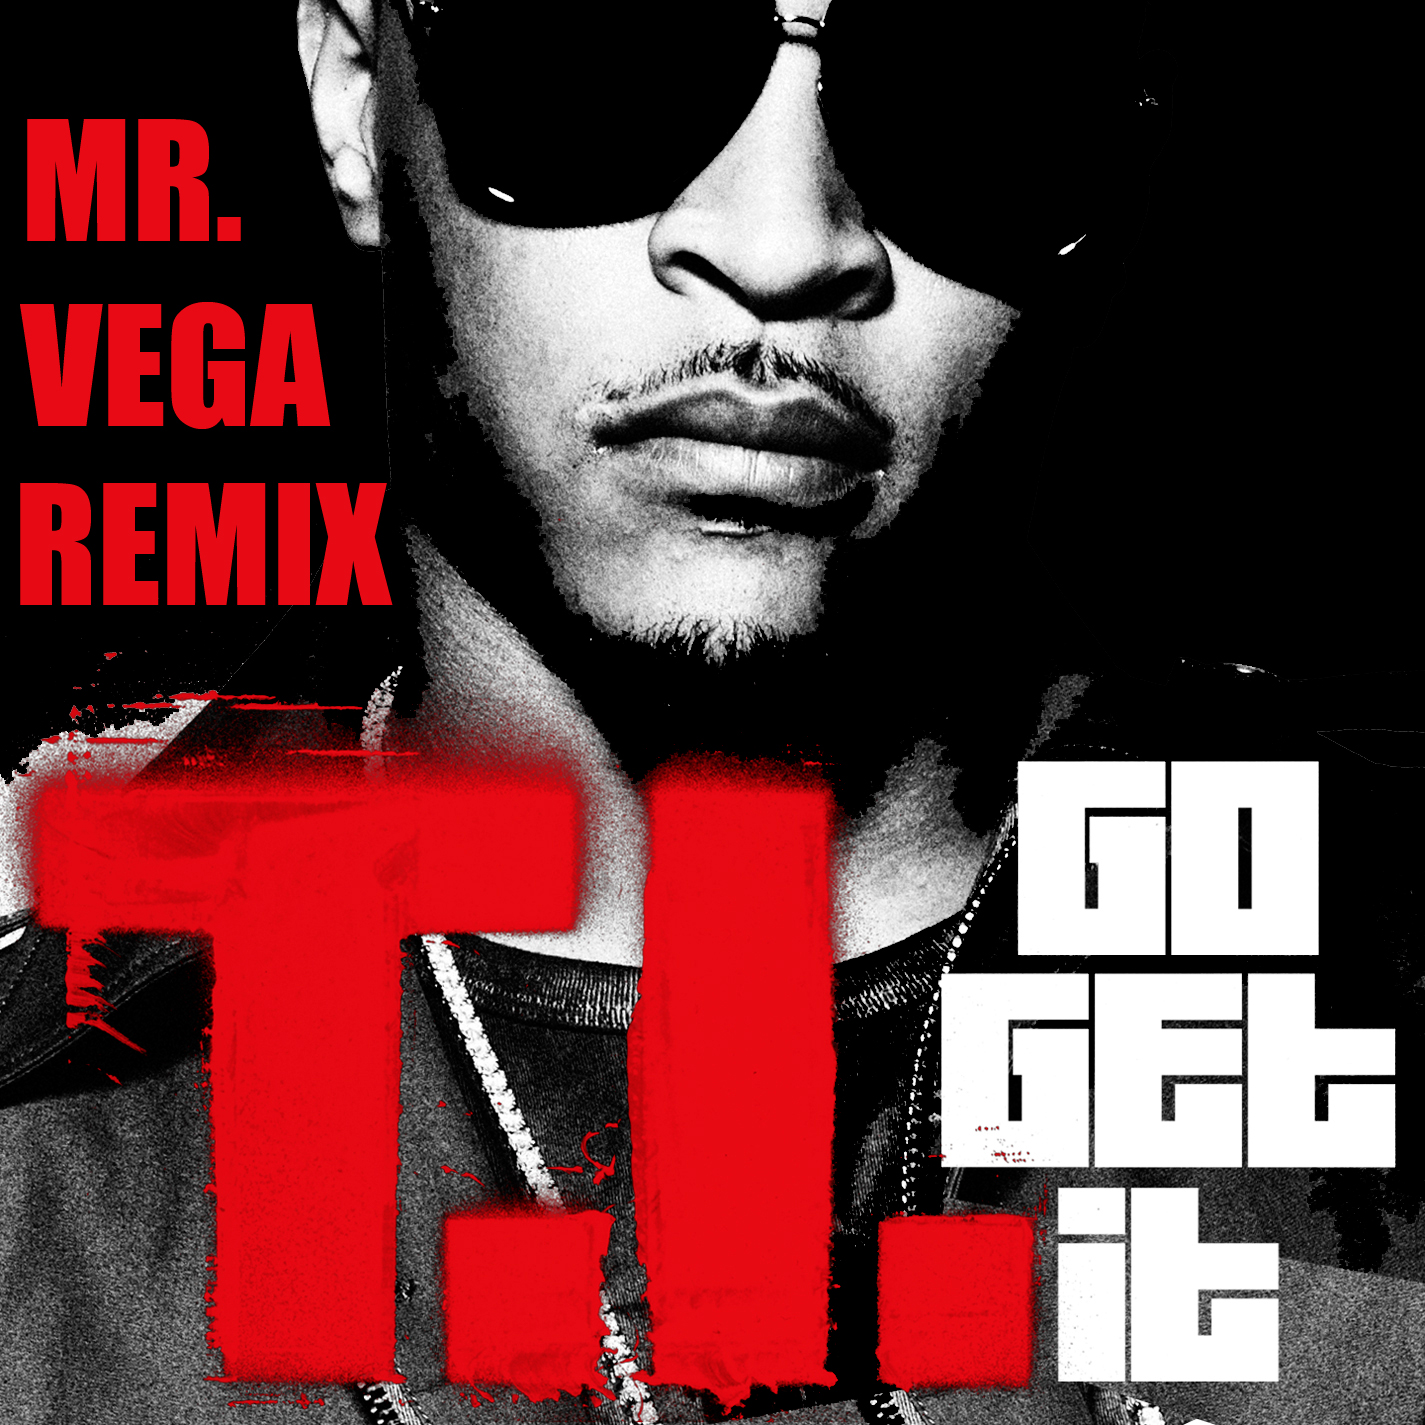 TRAP | T.I. - Go Get It (Mr. Vega Remix)